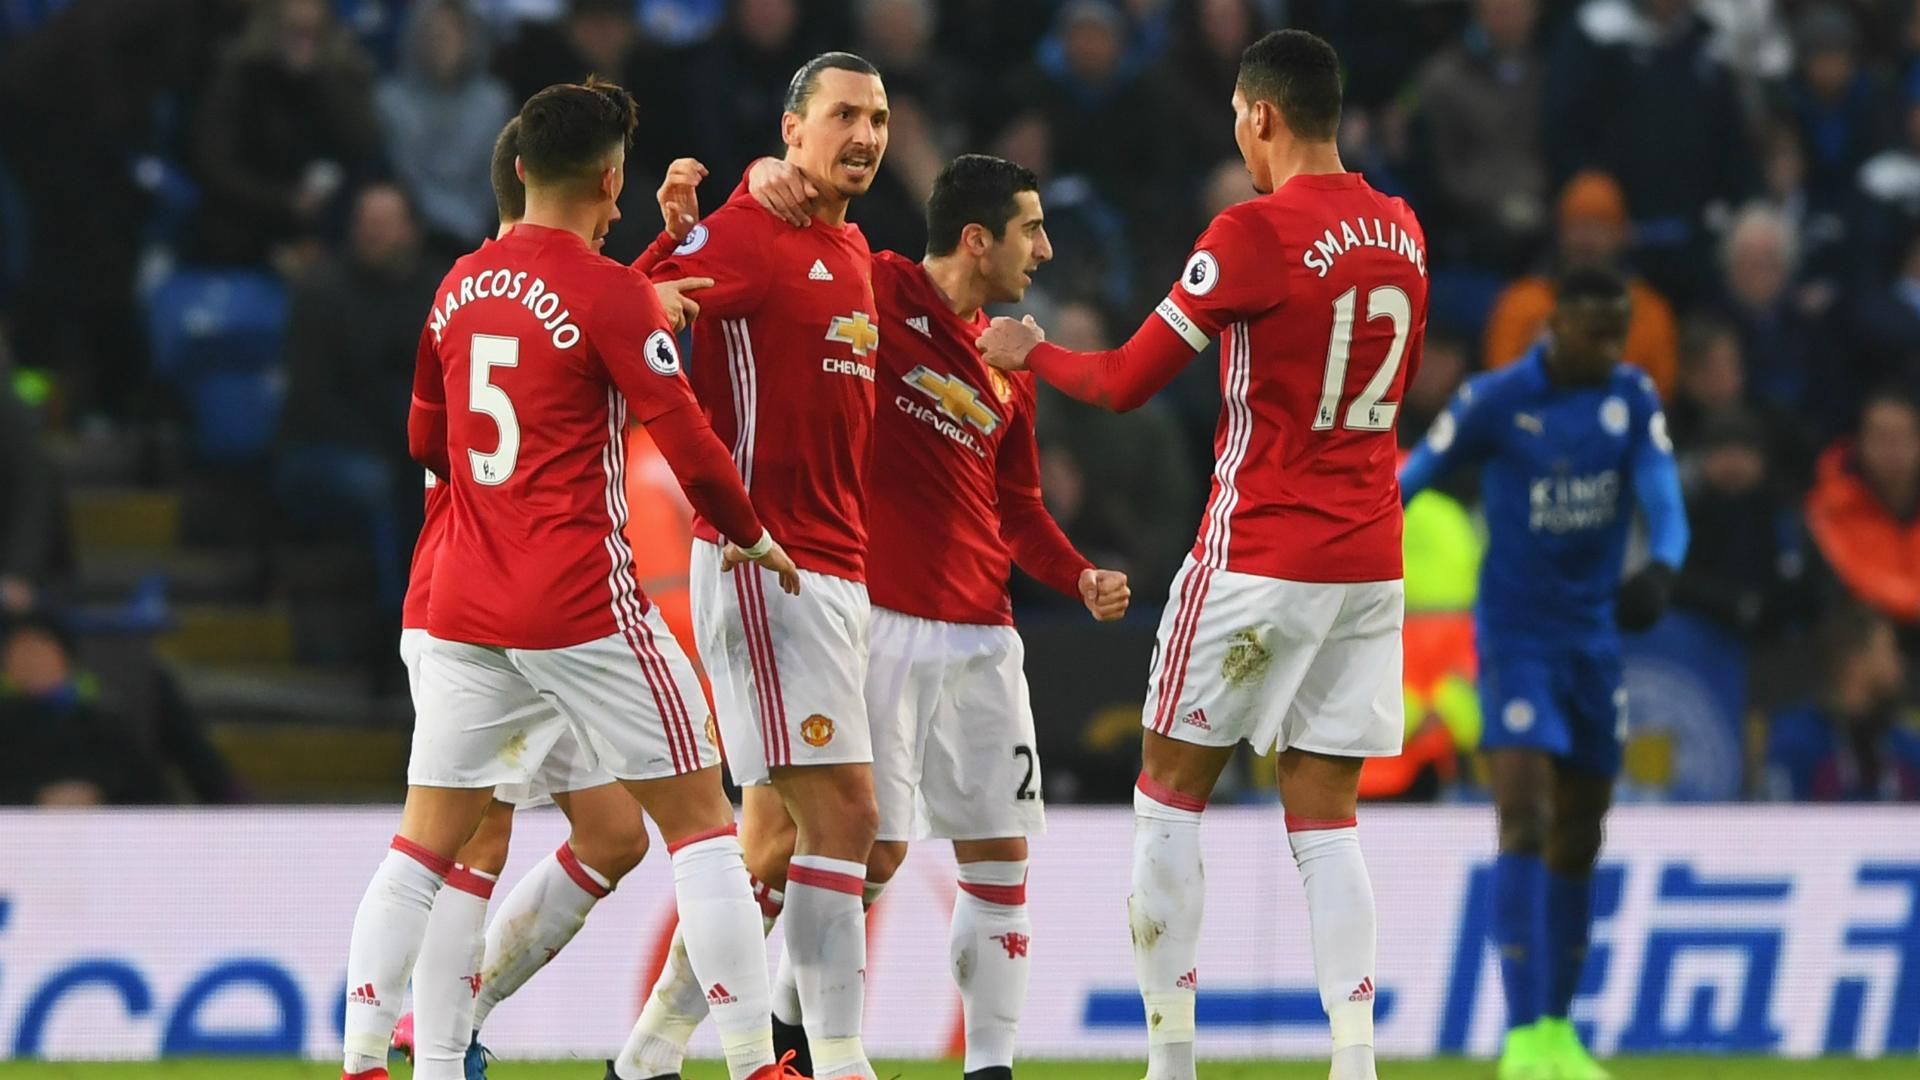 Manchester United derrotó por 3-0 al Leicester City